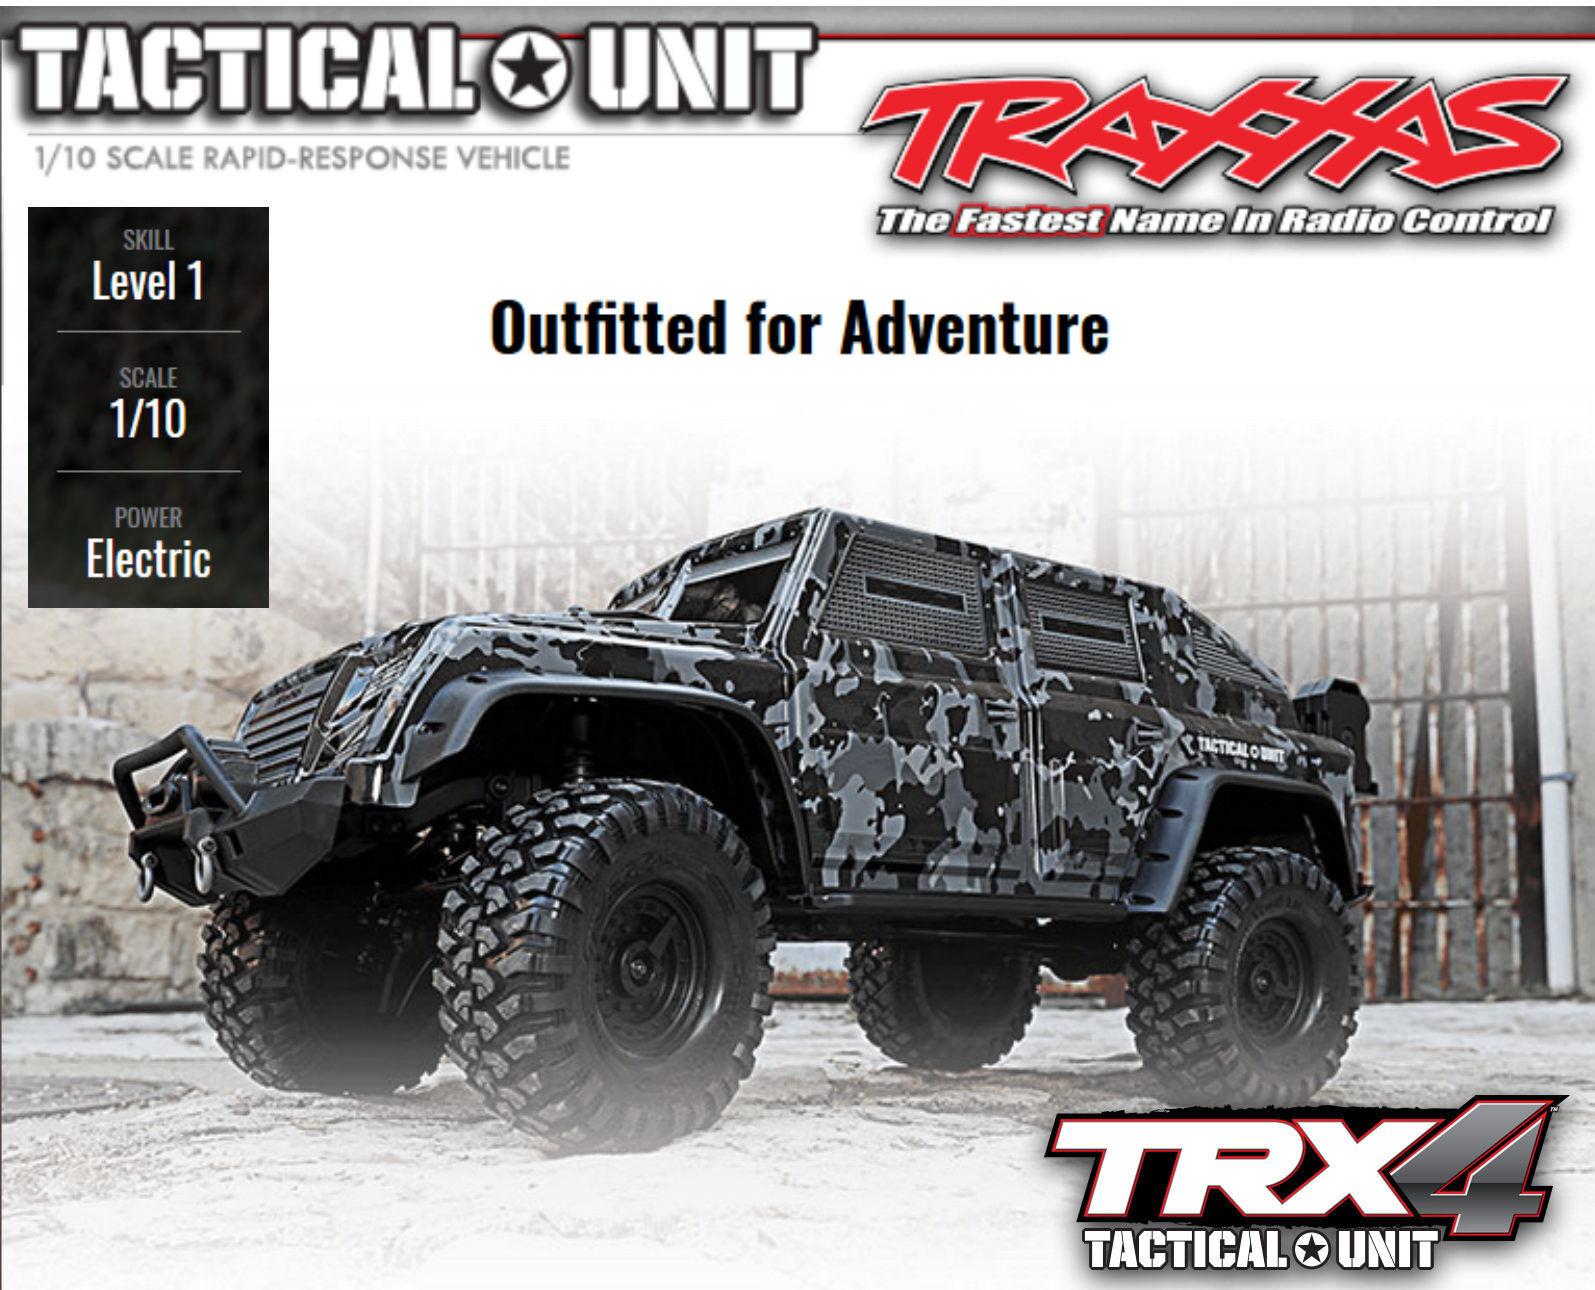 nuovo di marca TRAXXAS TRAXXAS TRAXXAS   trx82066-4 trx-4 Tactical Military guarda 1-10 Crawler 2,4 GHz  vendita online risparmia il 70%